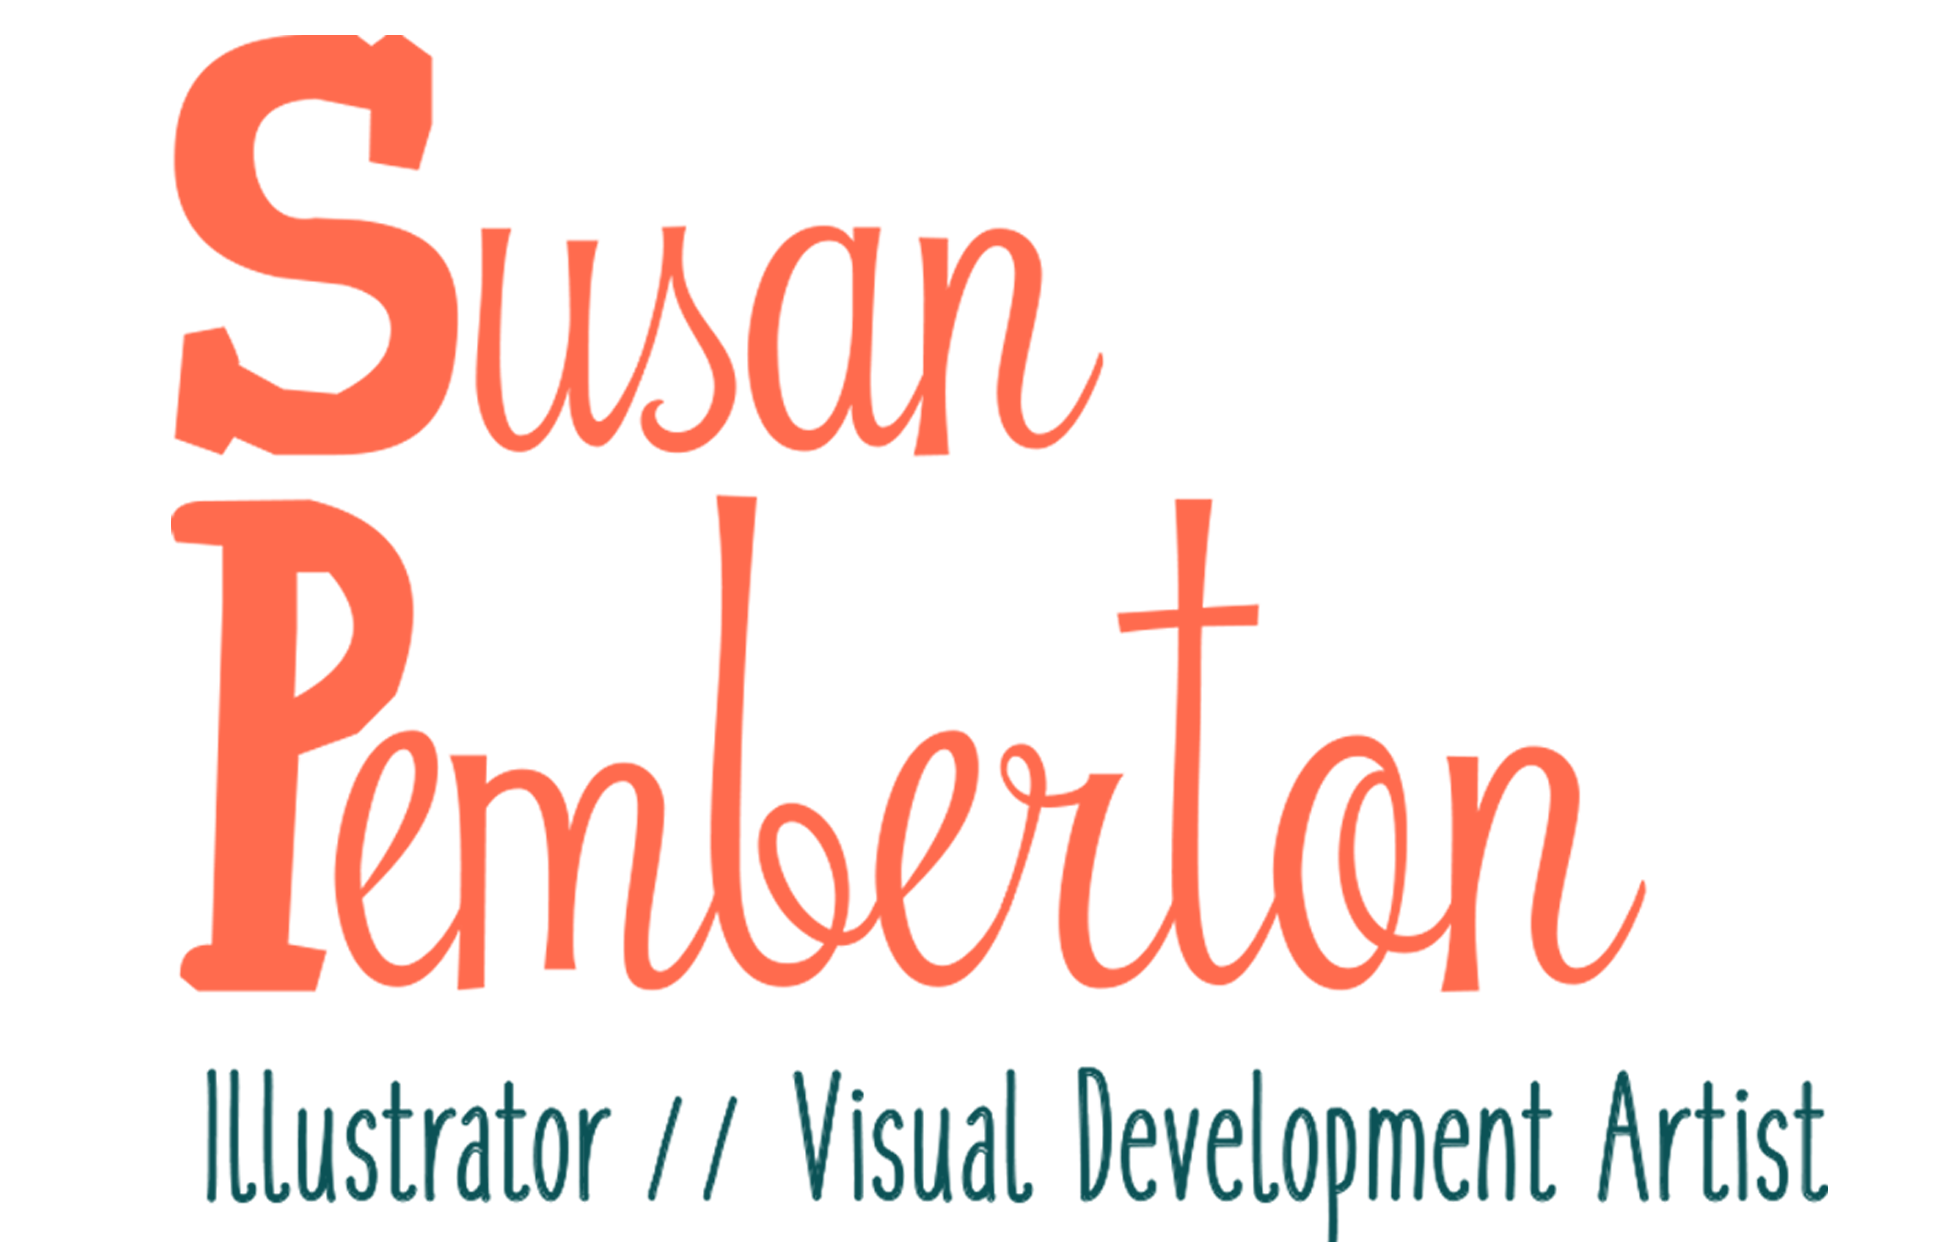 Susan Pemberton